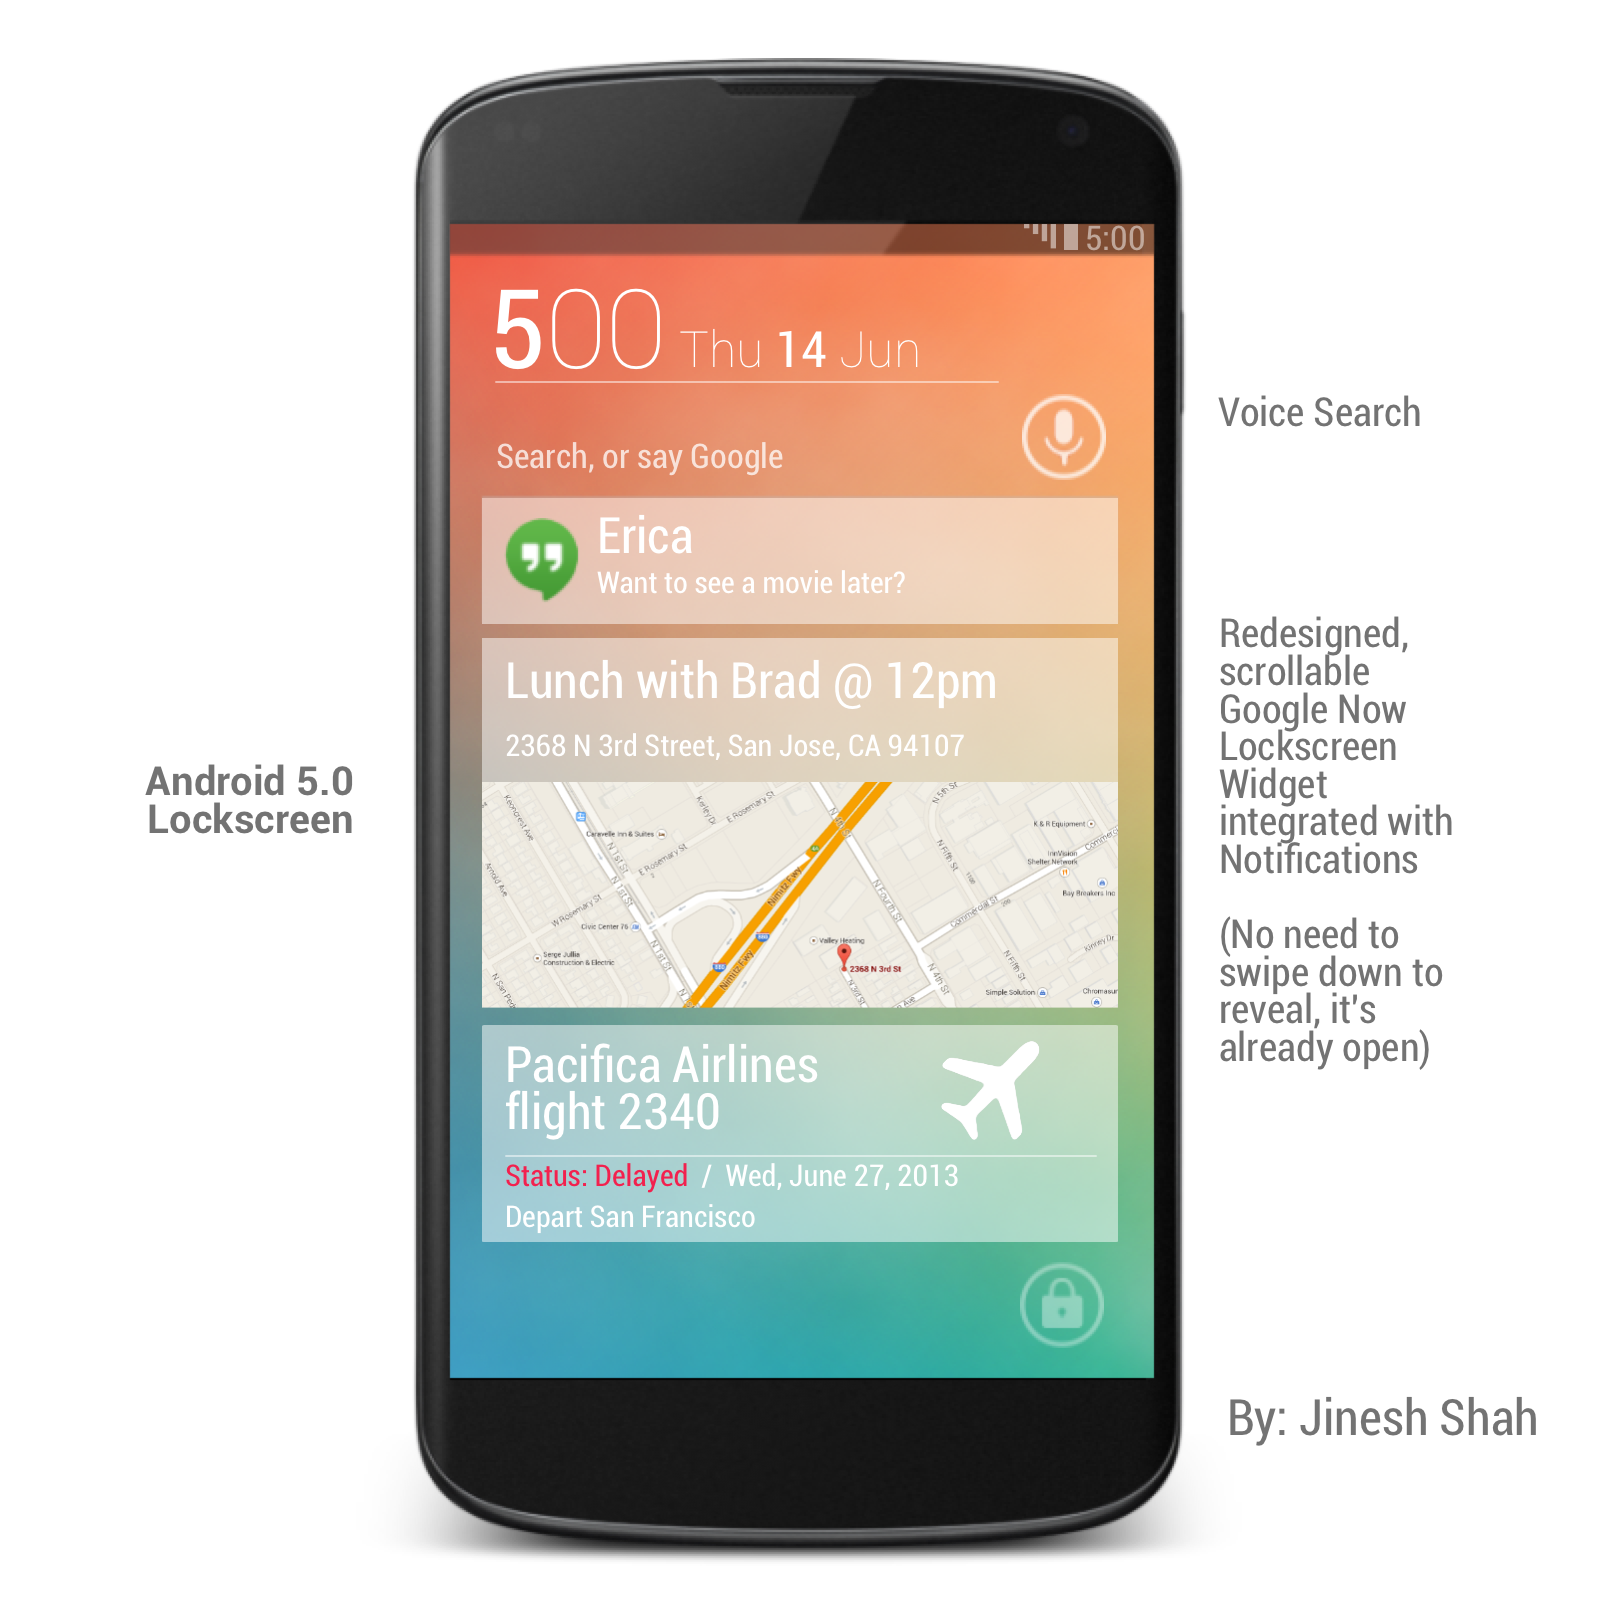 Koncept vzhledu Androidu 5.0 Key Lime Pie